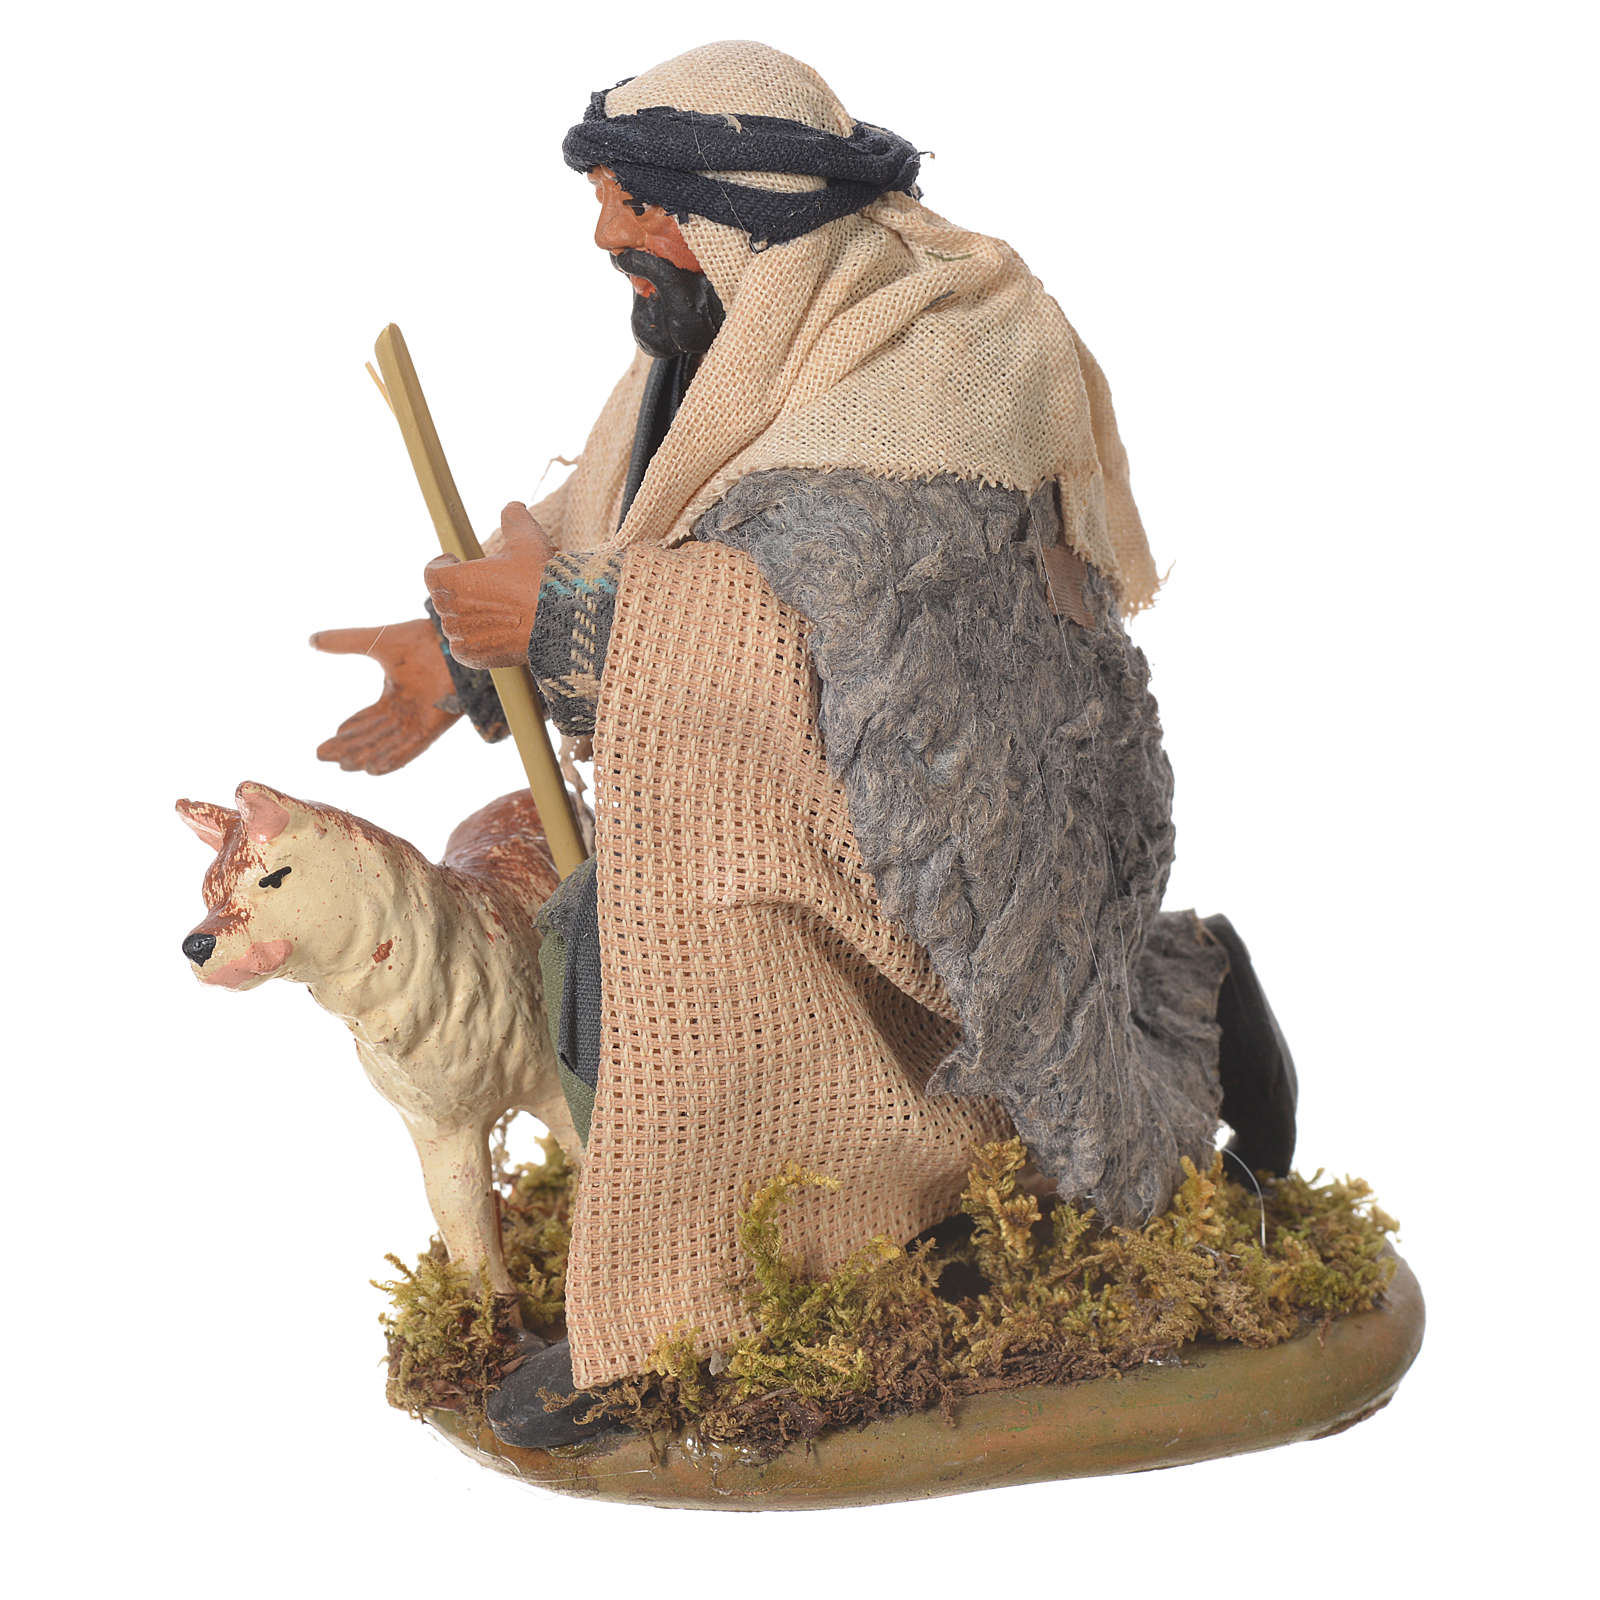 Uomo inginocchiato con cane 12 cm presepe Napoli 4